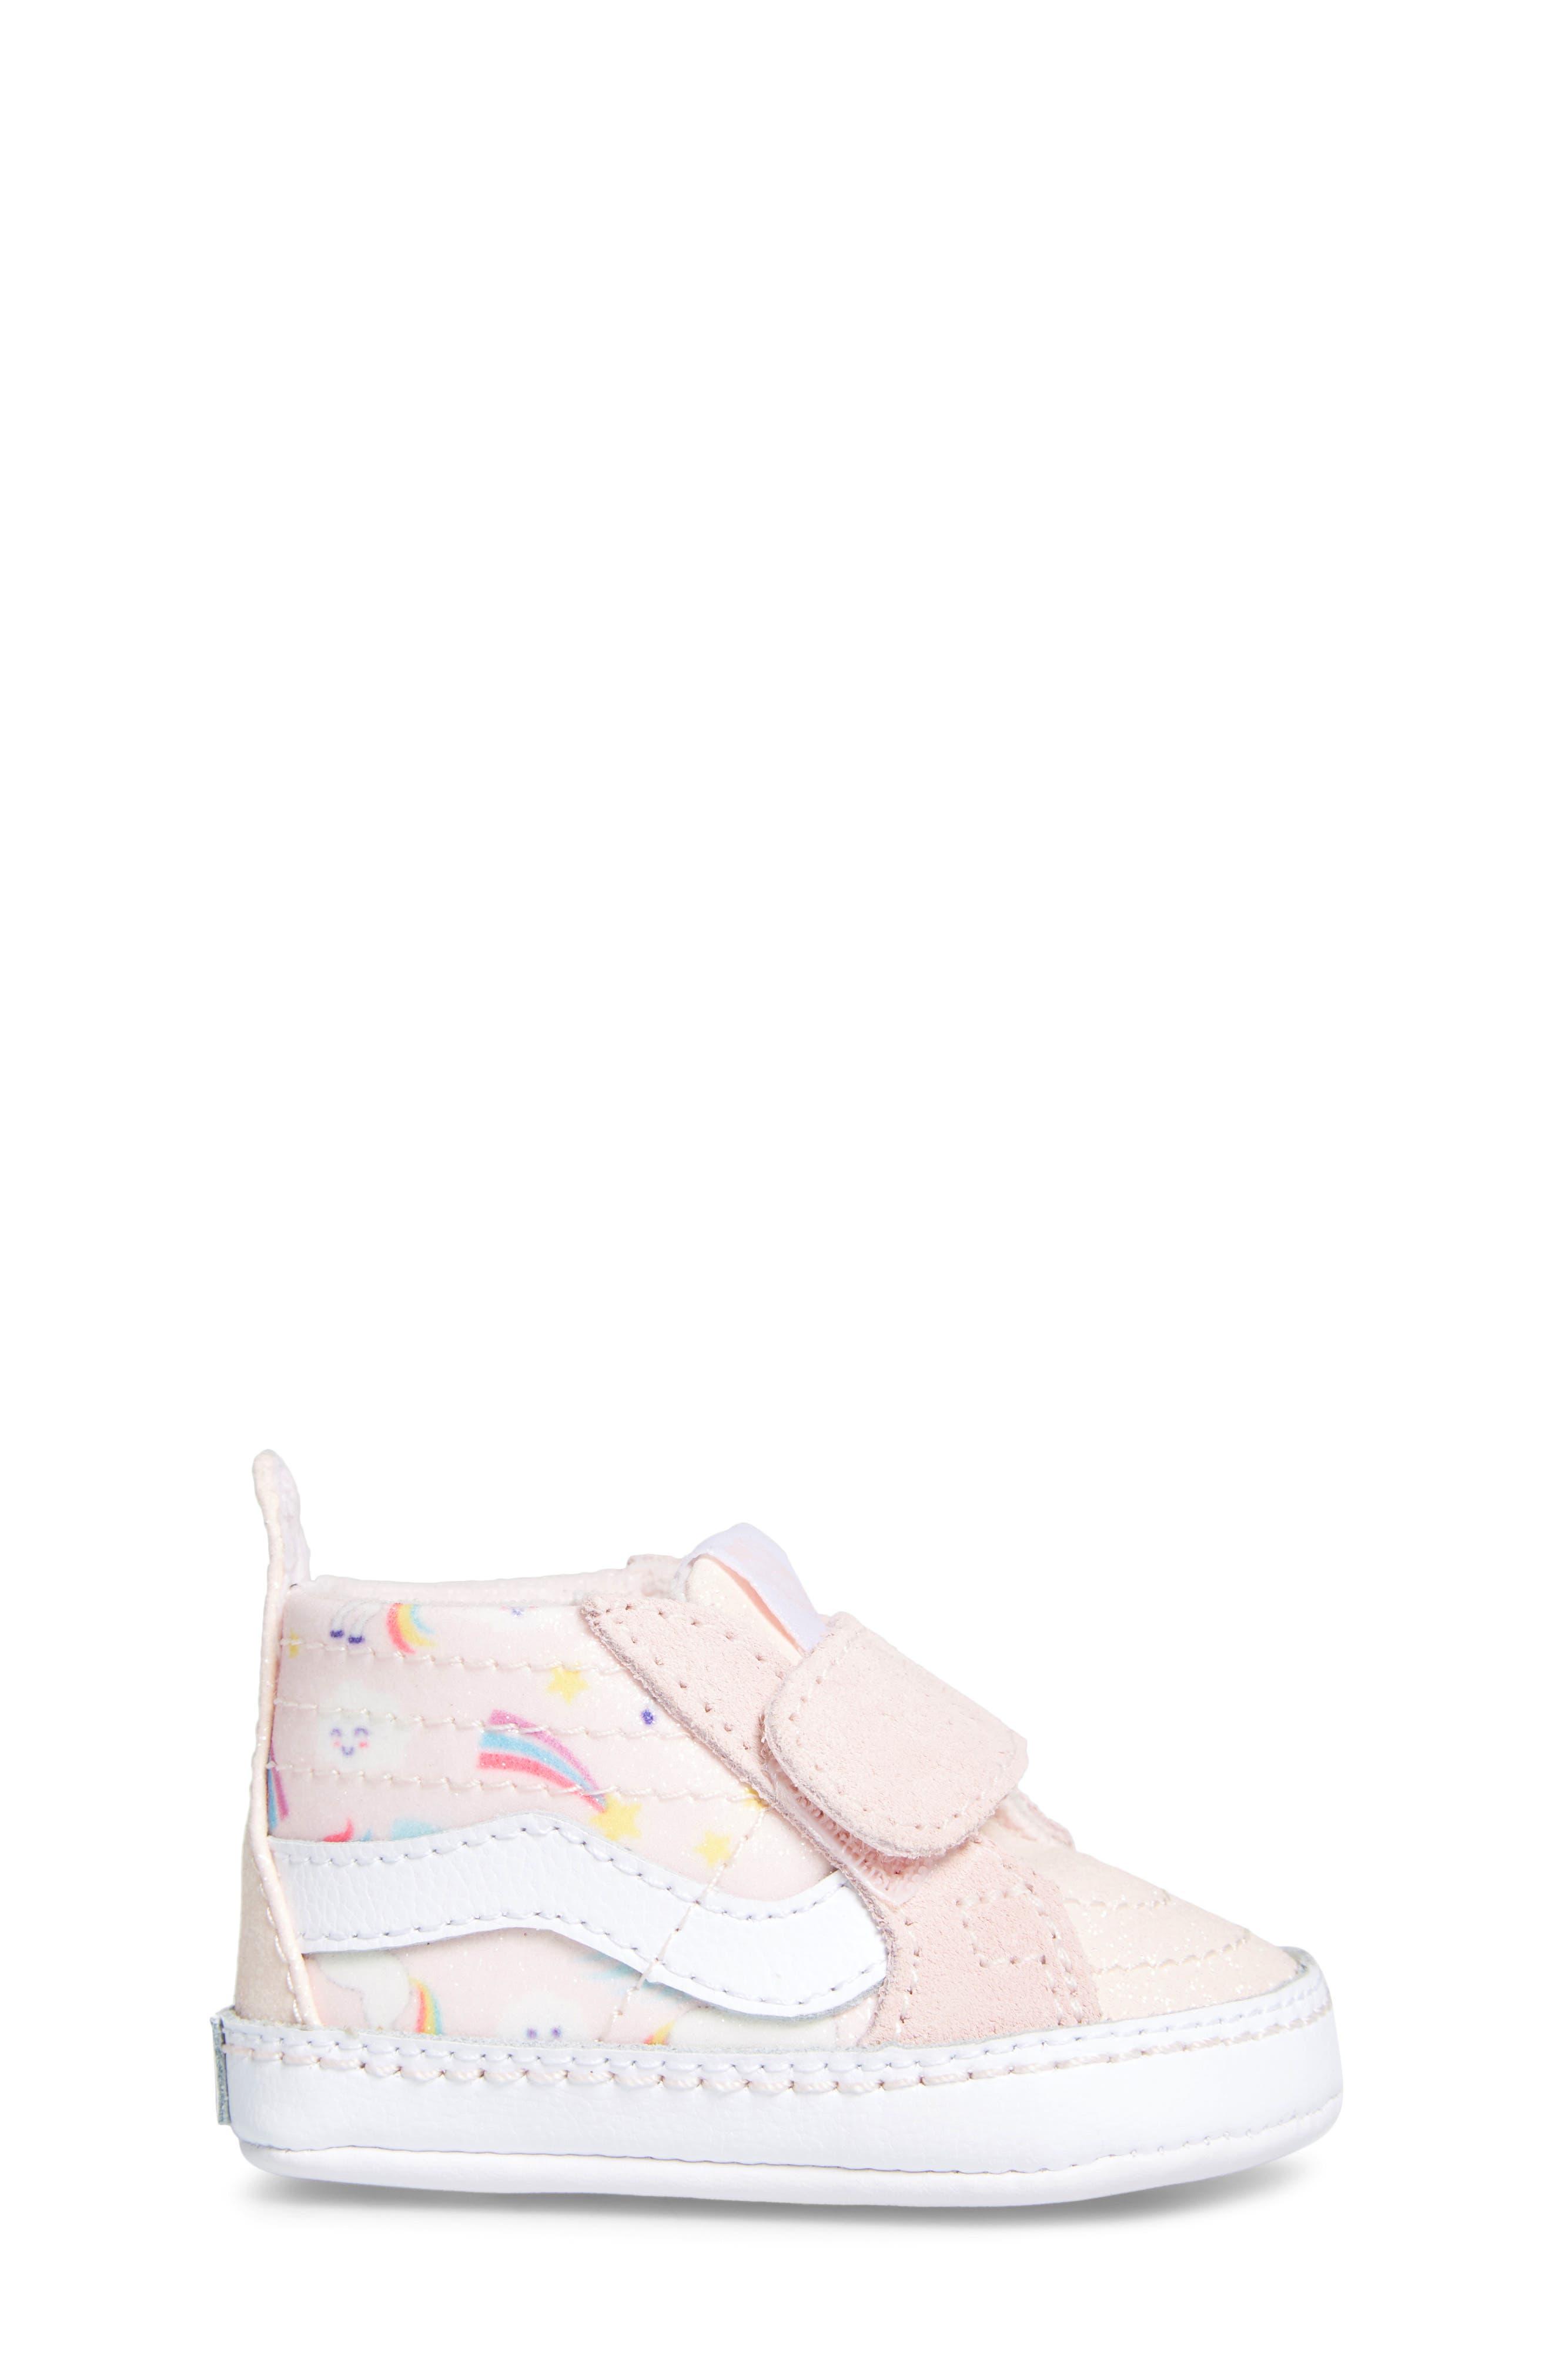 'SK8-Hi' Crib Sneaker,                             Alternate thumbnail 3, color,                             GLITTER PEGASUS PINK/ WHITE